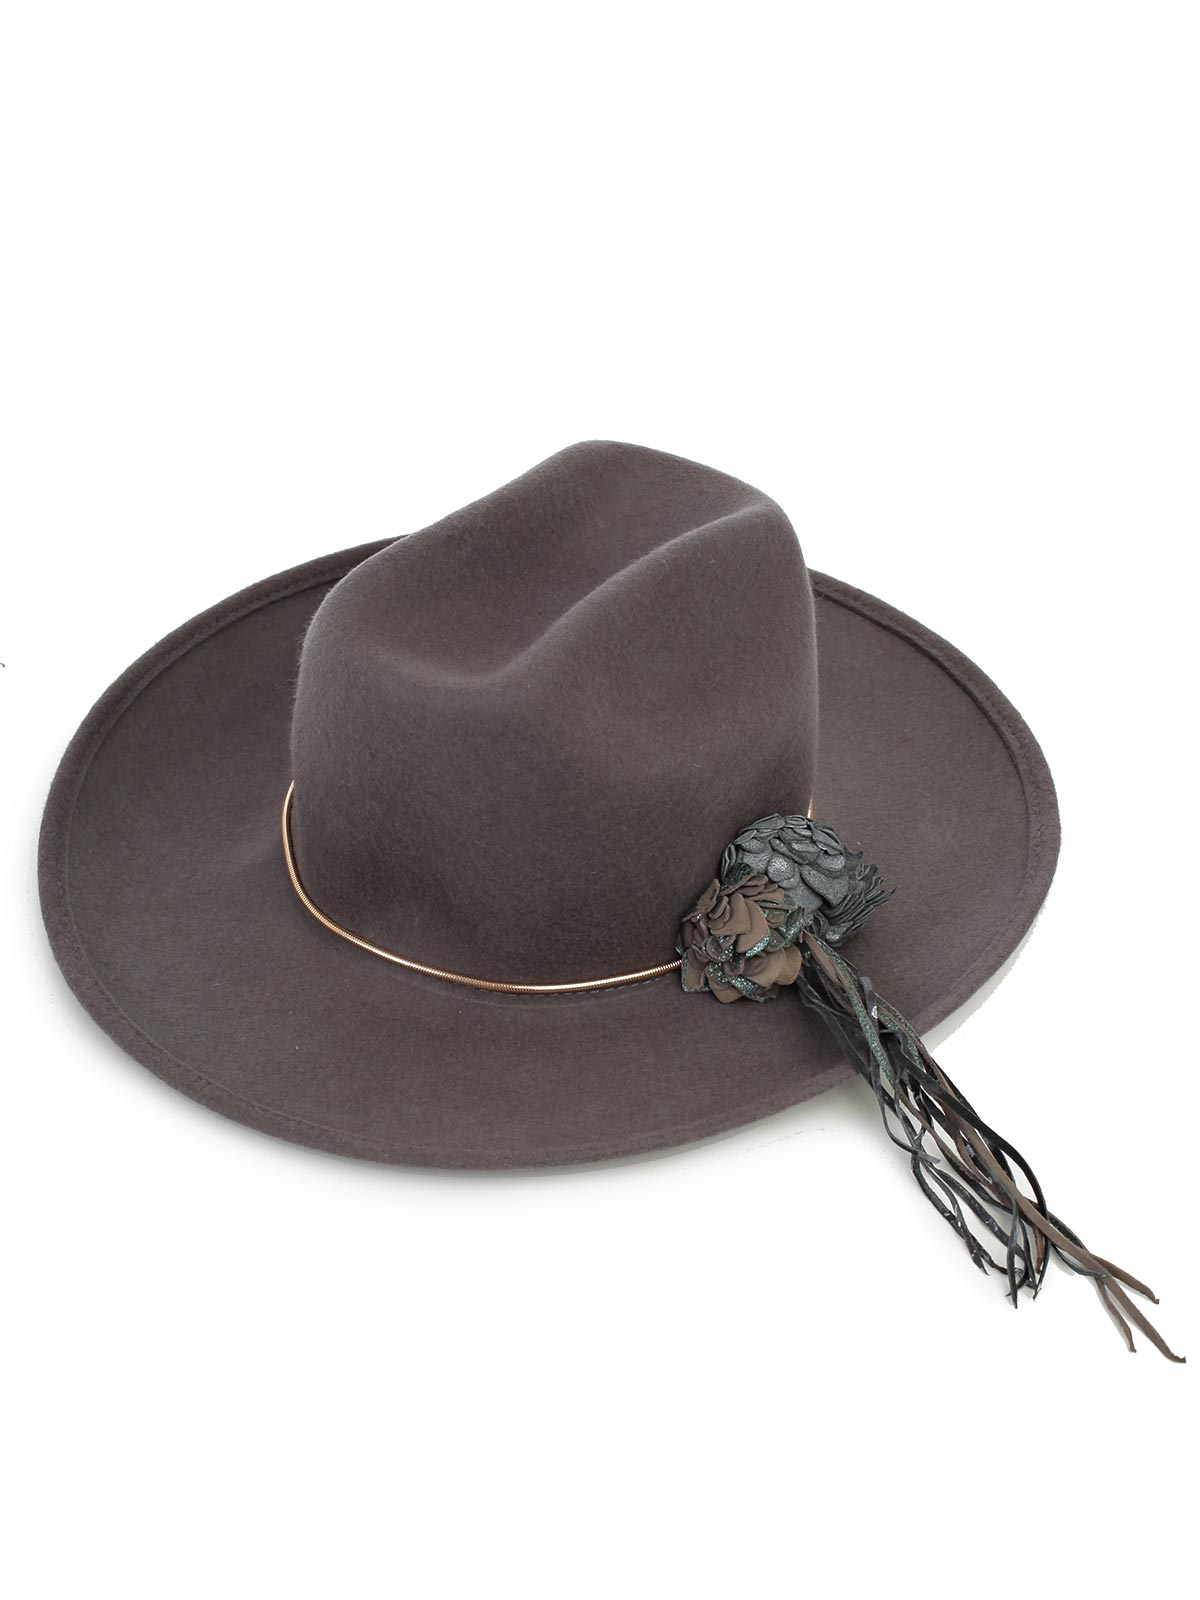 Picture of GOLDEN GOOSE DELUXE BRAND HAT CAPPELLO TANGO PARIS